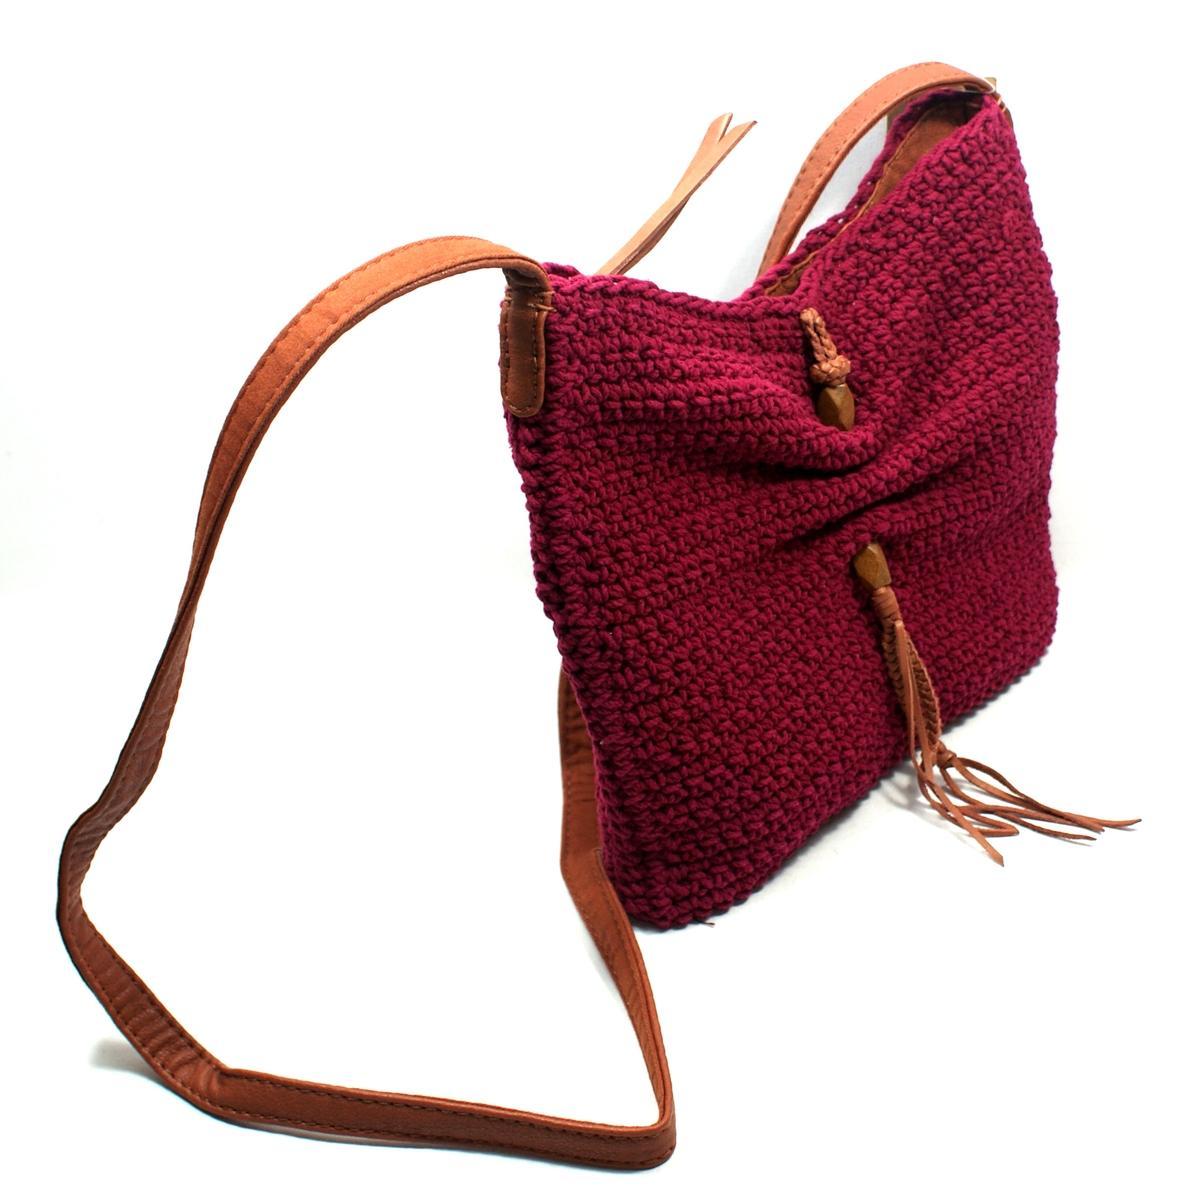 Crochet Crossbody Bag : Lucky Brand Ojai Crochet Wine Swing/ Crossbody Bag #HKW0067 Lucky ...